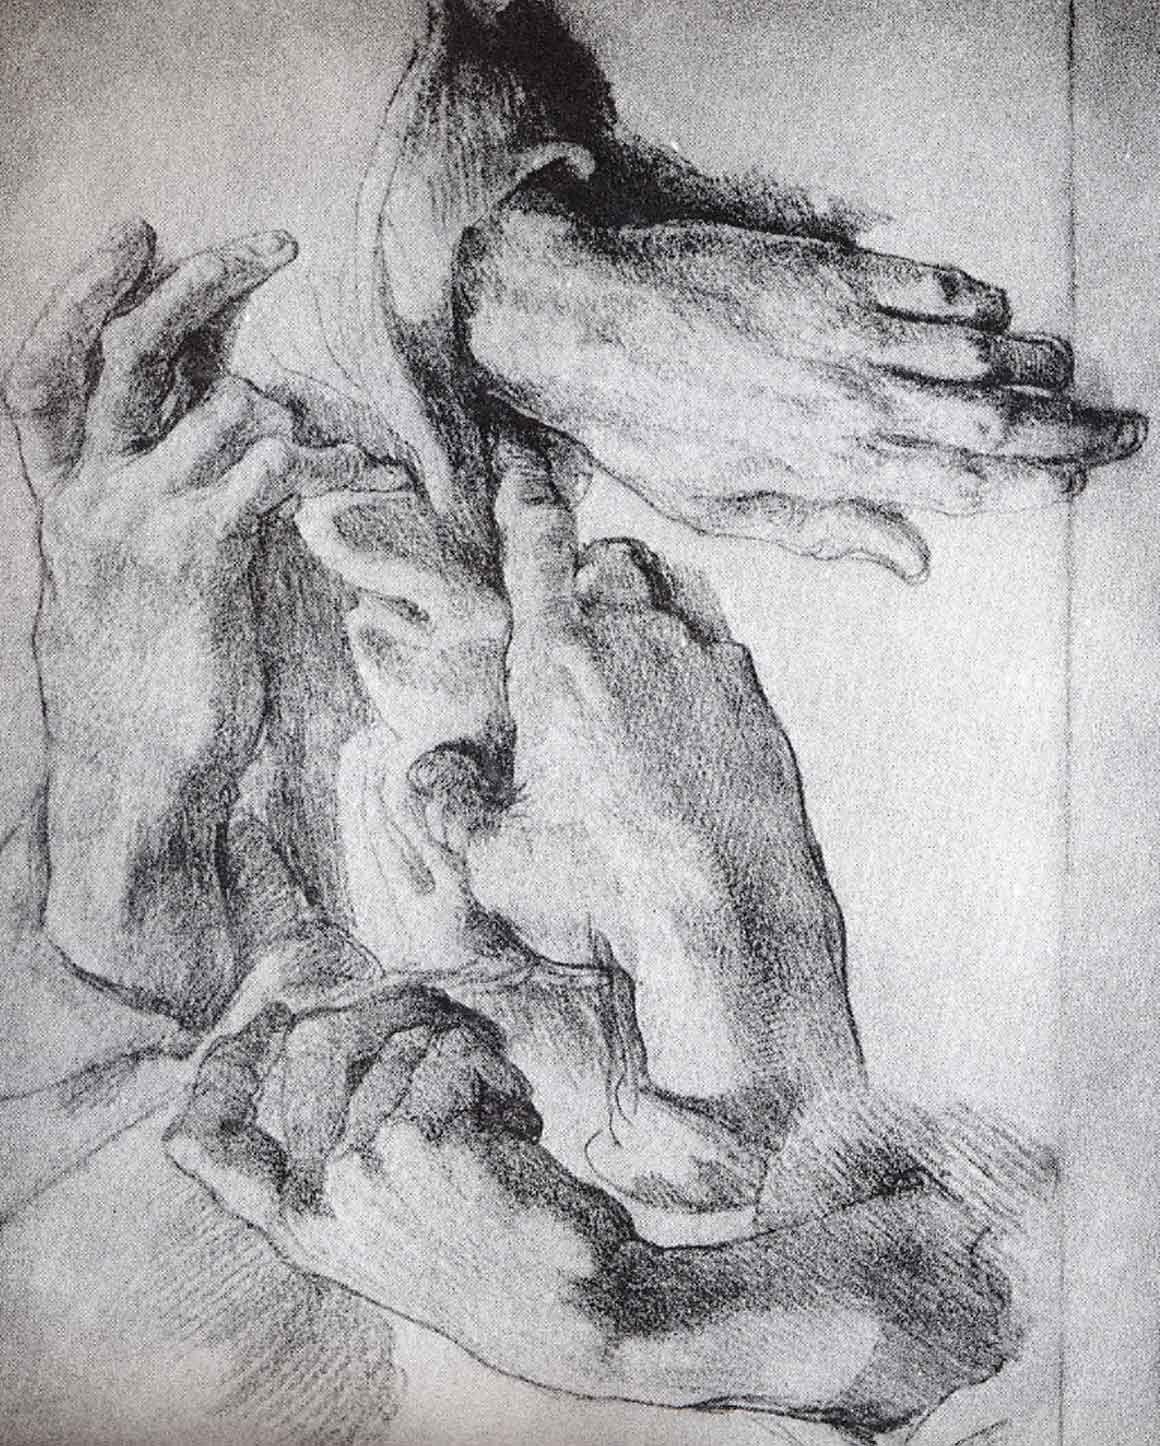 Hands by Michelangelo | ART misc. | Pinterest | Anatomía ...